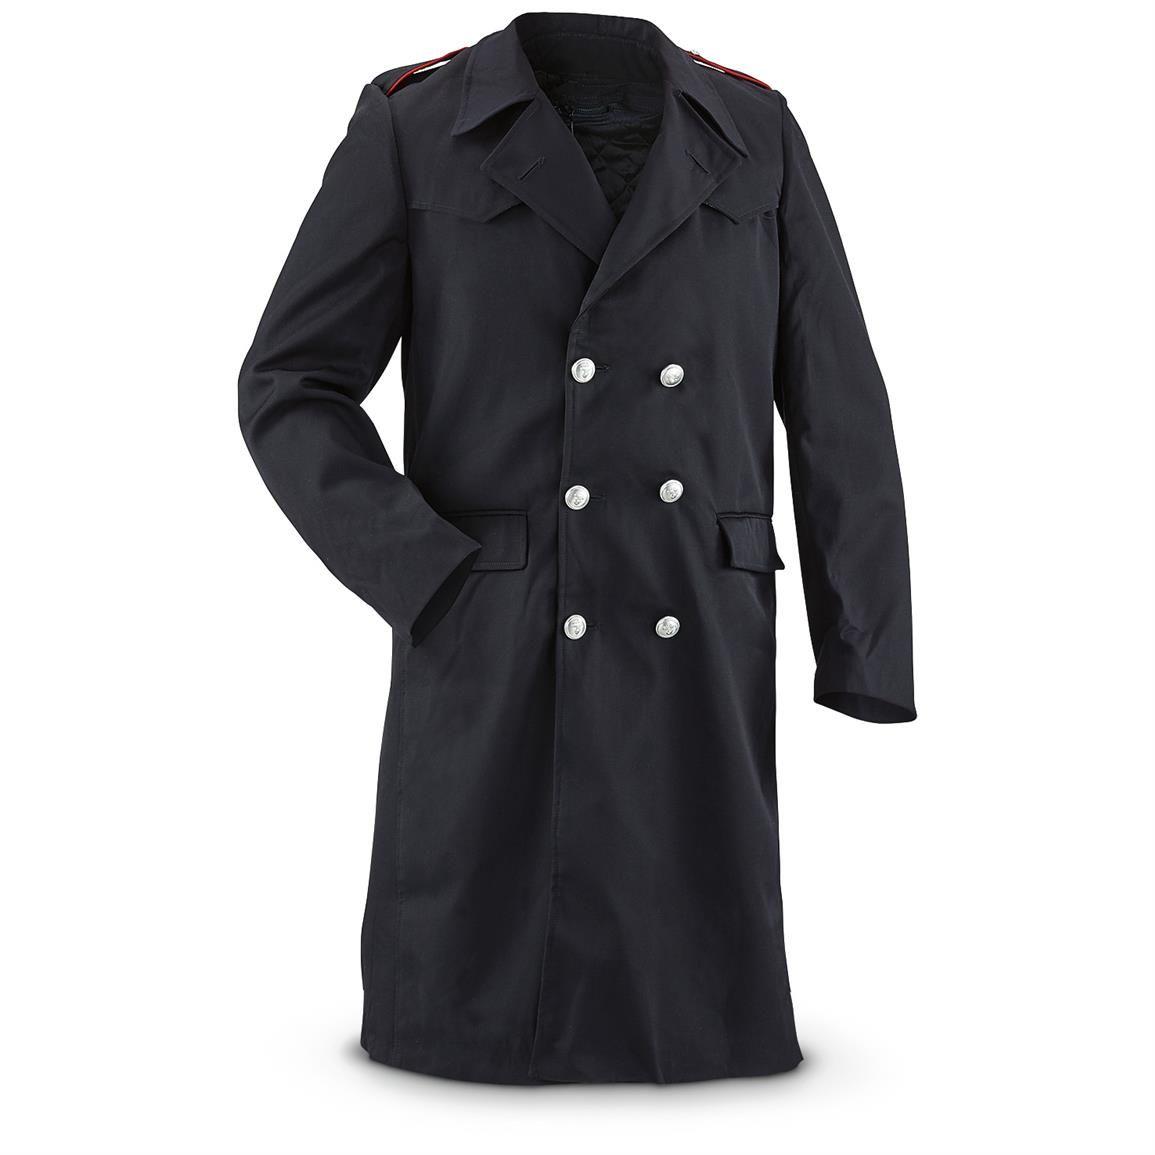 b1943f60766 New Italian Military Police Surplus Carabinieri Overcoat